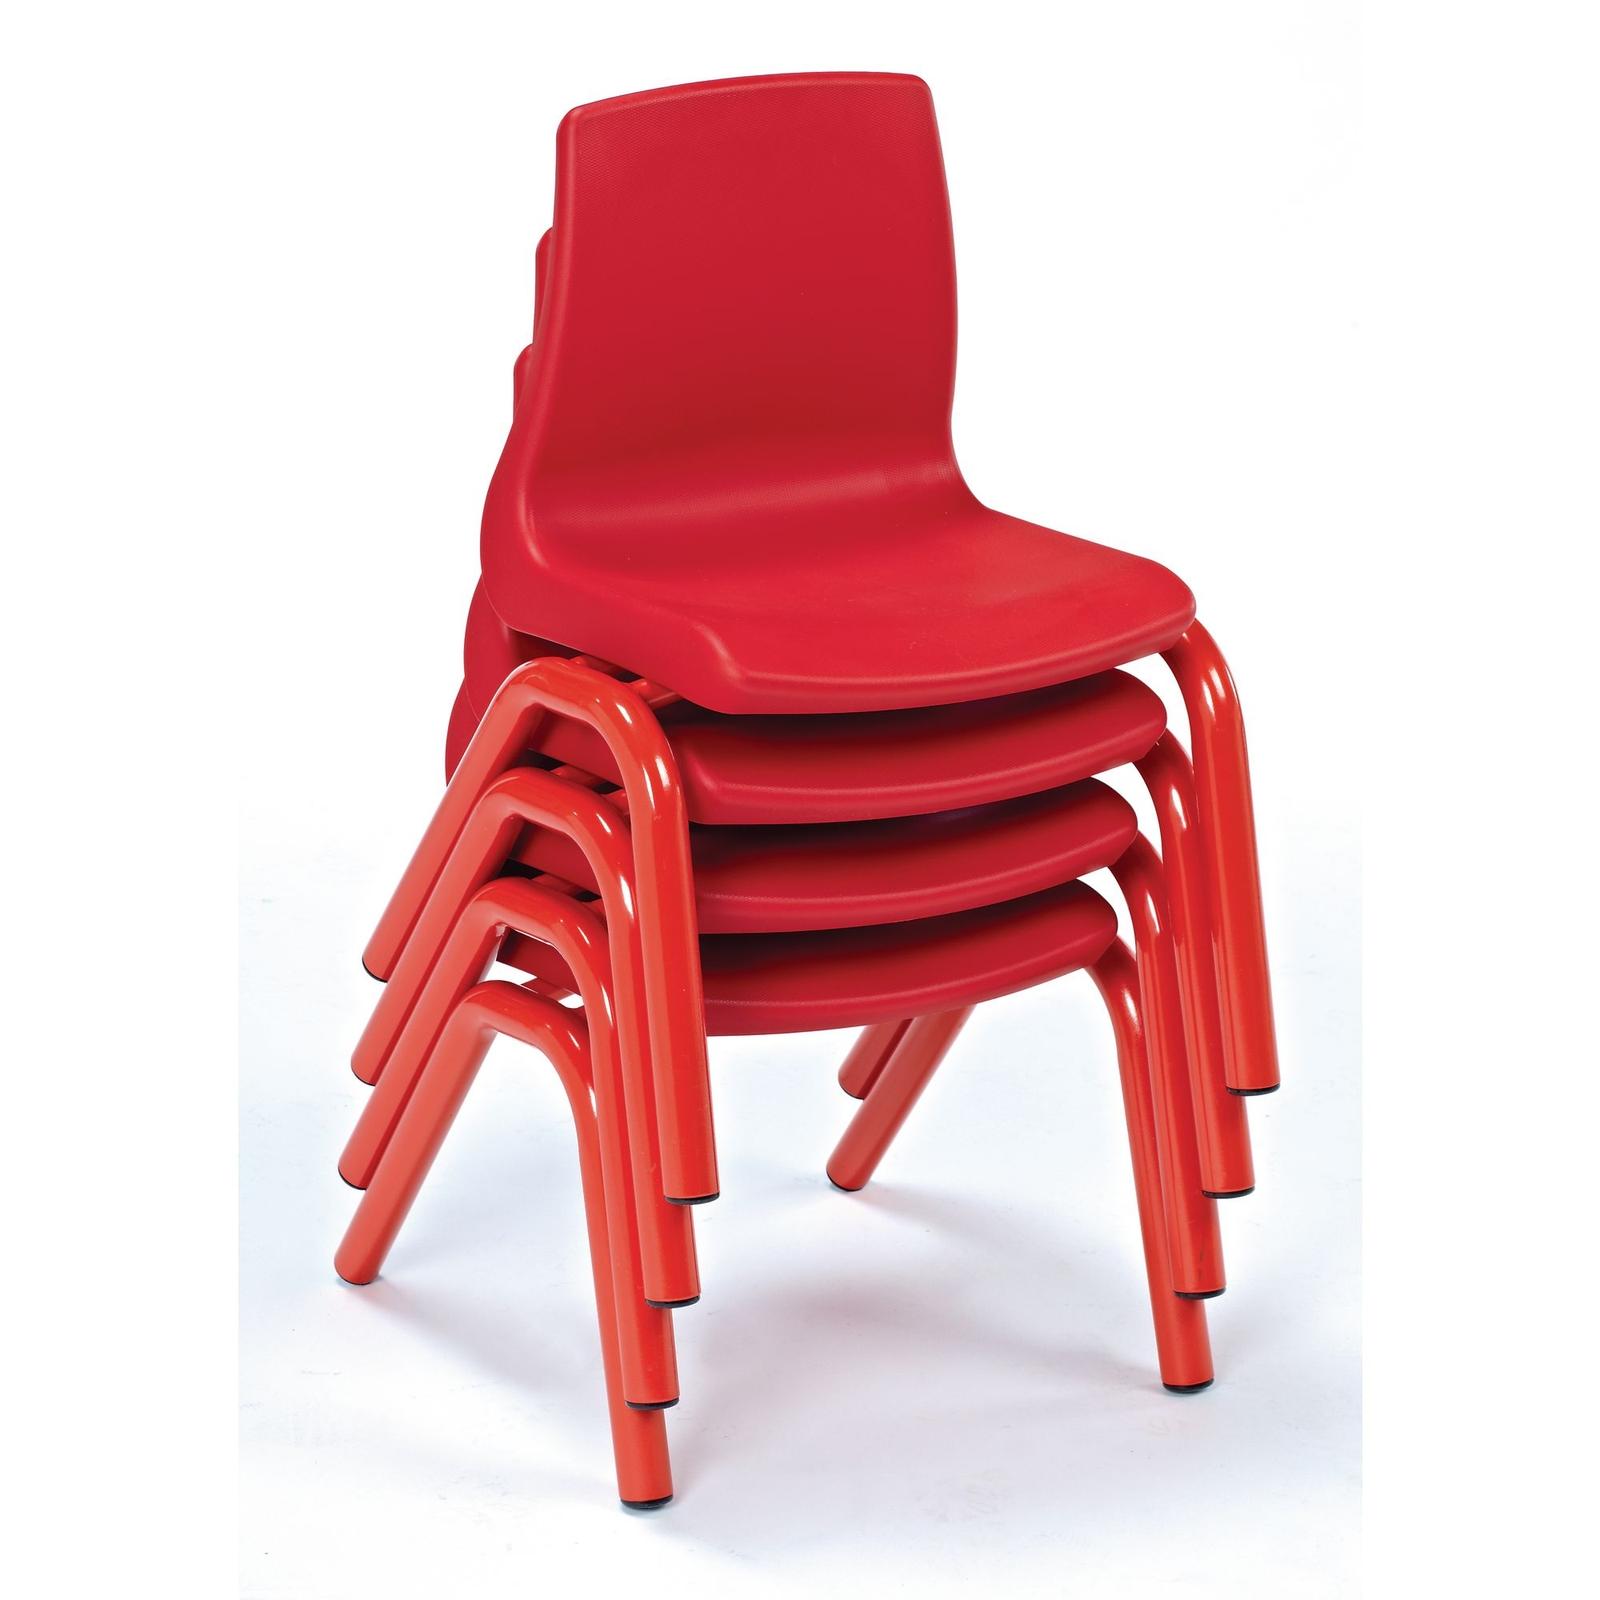 Harlequin Chairs - Pre School - Seat height: 200mm - Purple